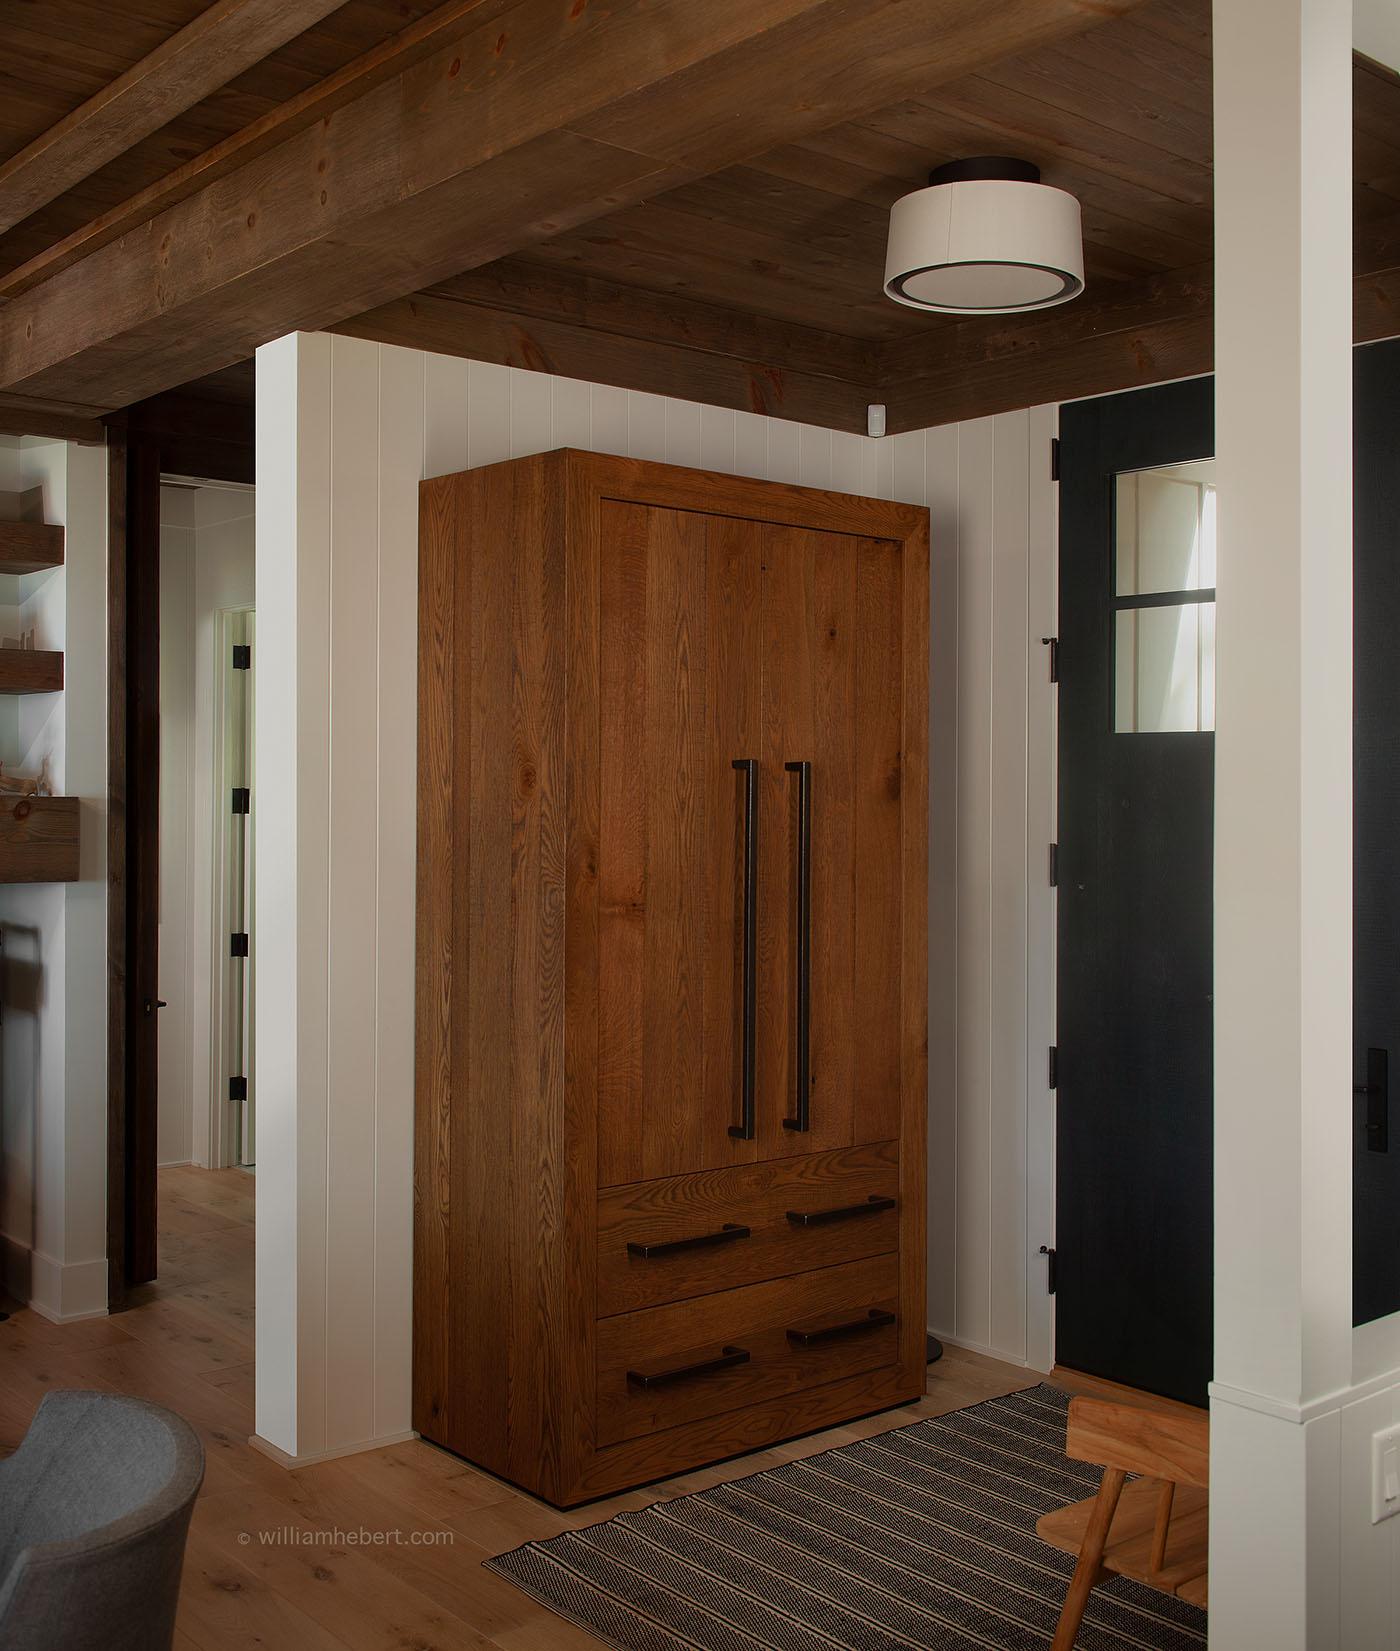 Architecture_Interior_33.jpg